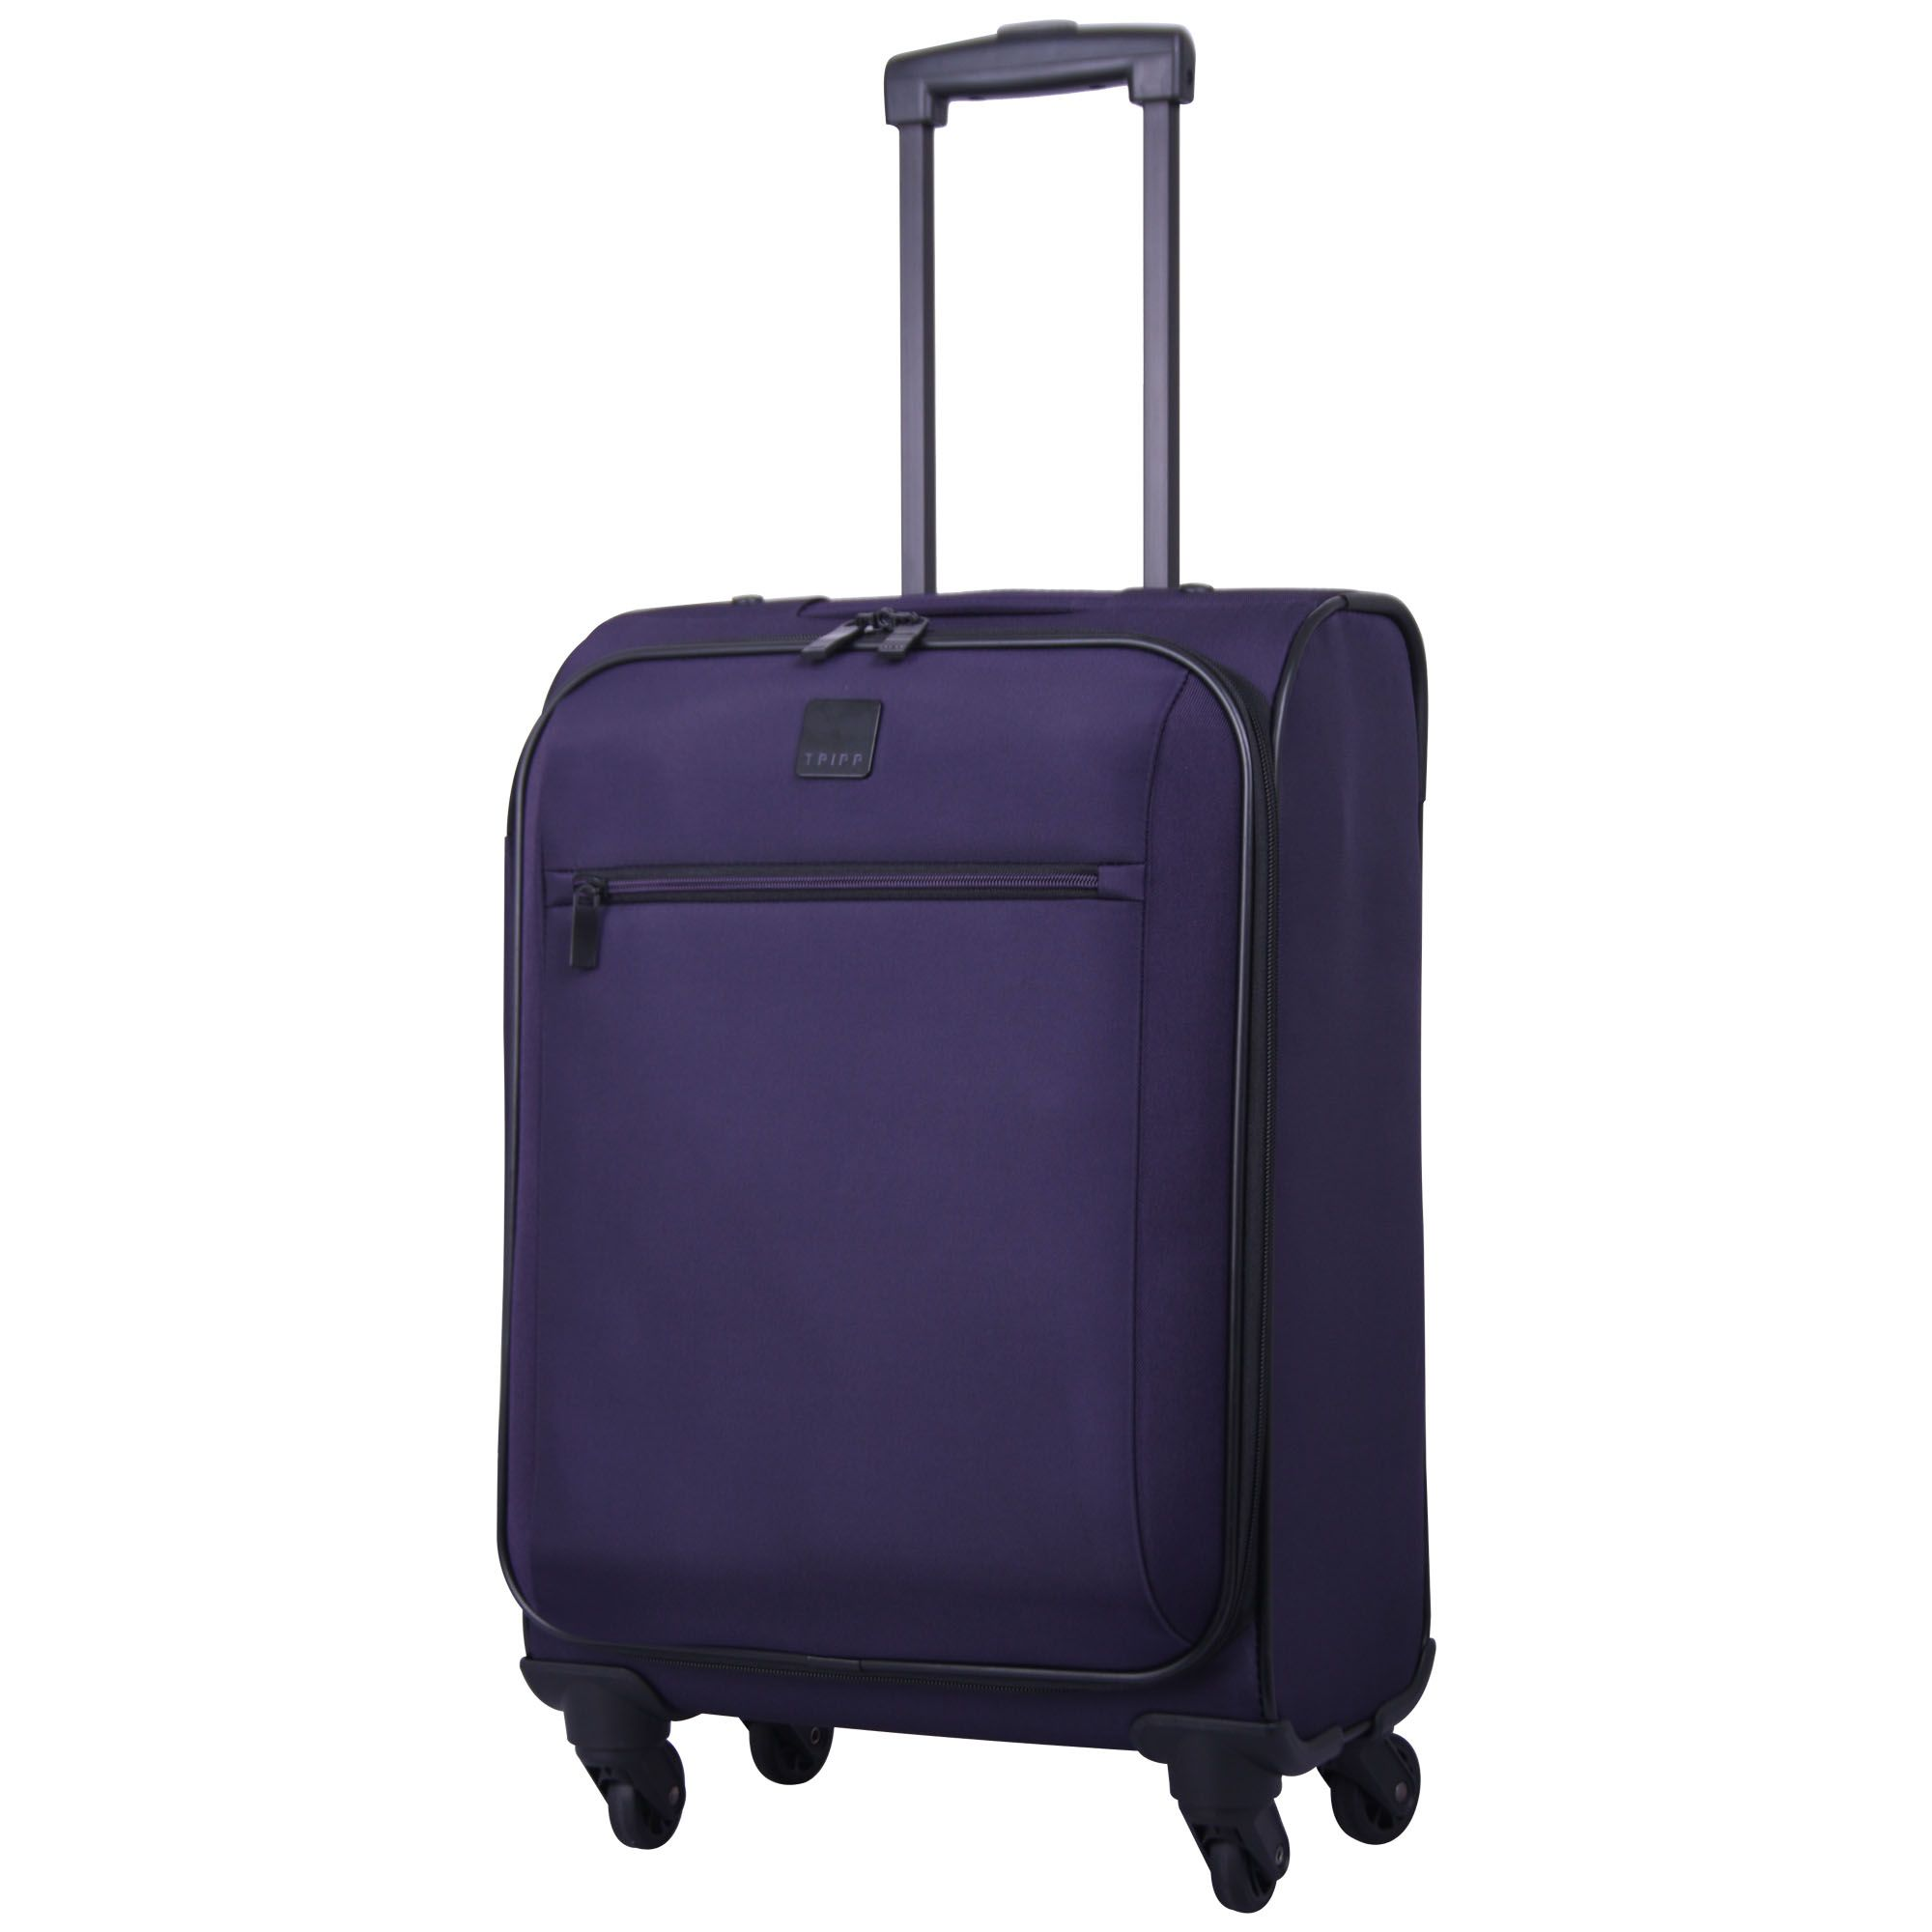 tripp grape 39 full circle 39 4 wheel cabin suitcase soft. Black Bedroom Furniture Sets. Home Design Ideas